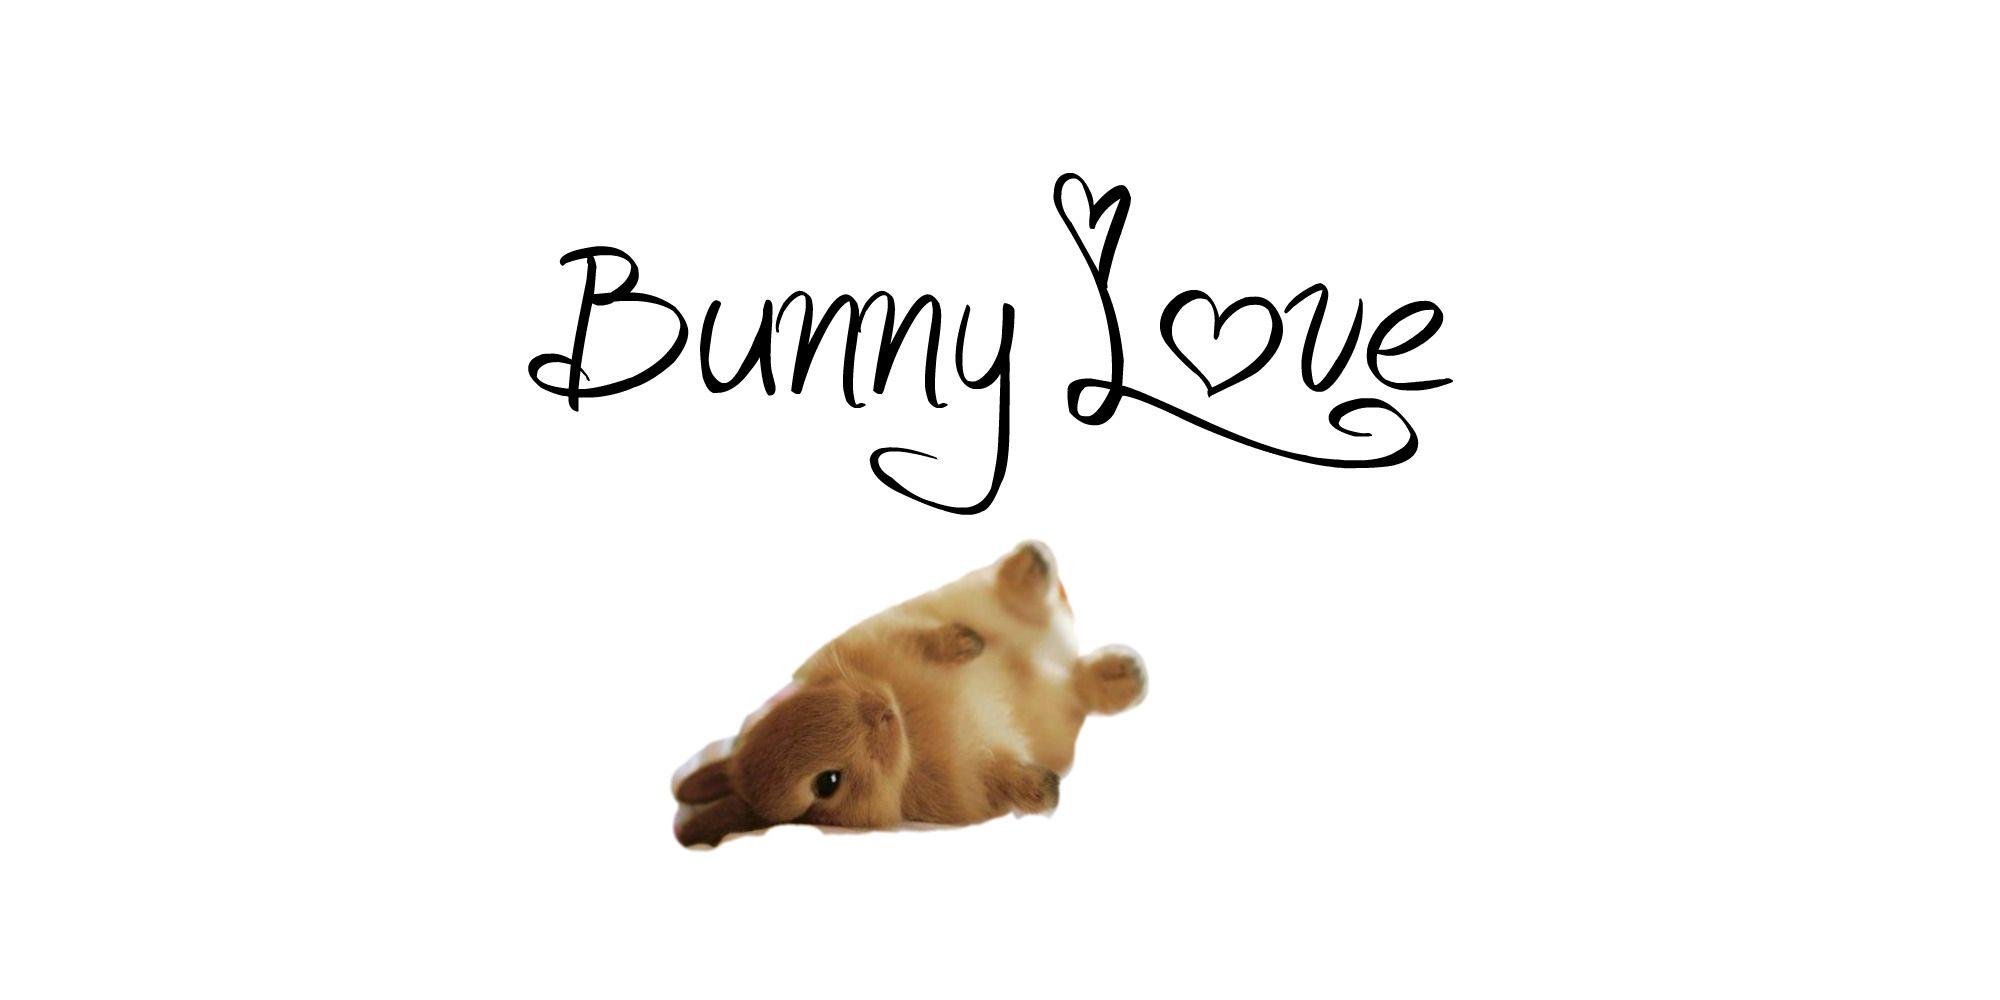 Bunny Love computer wallpaper